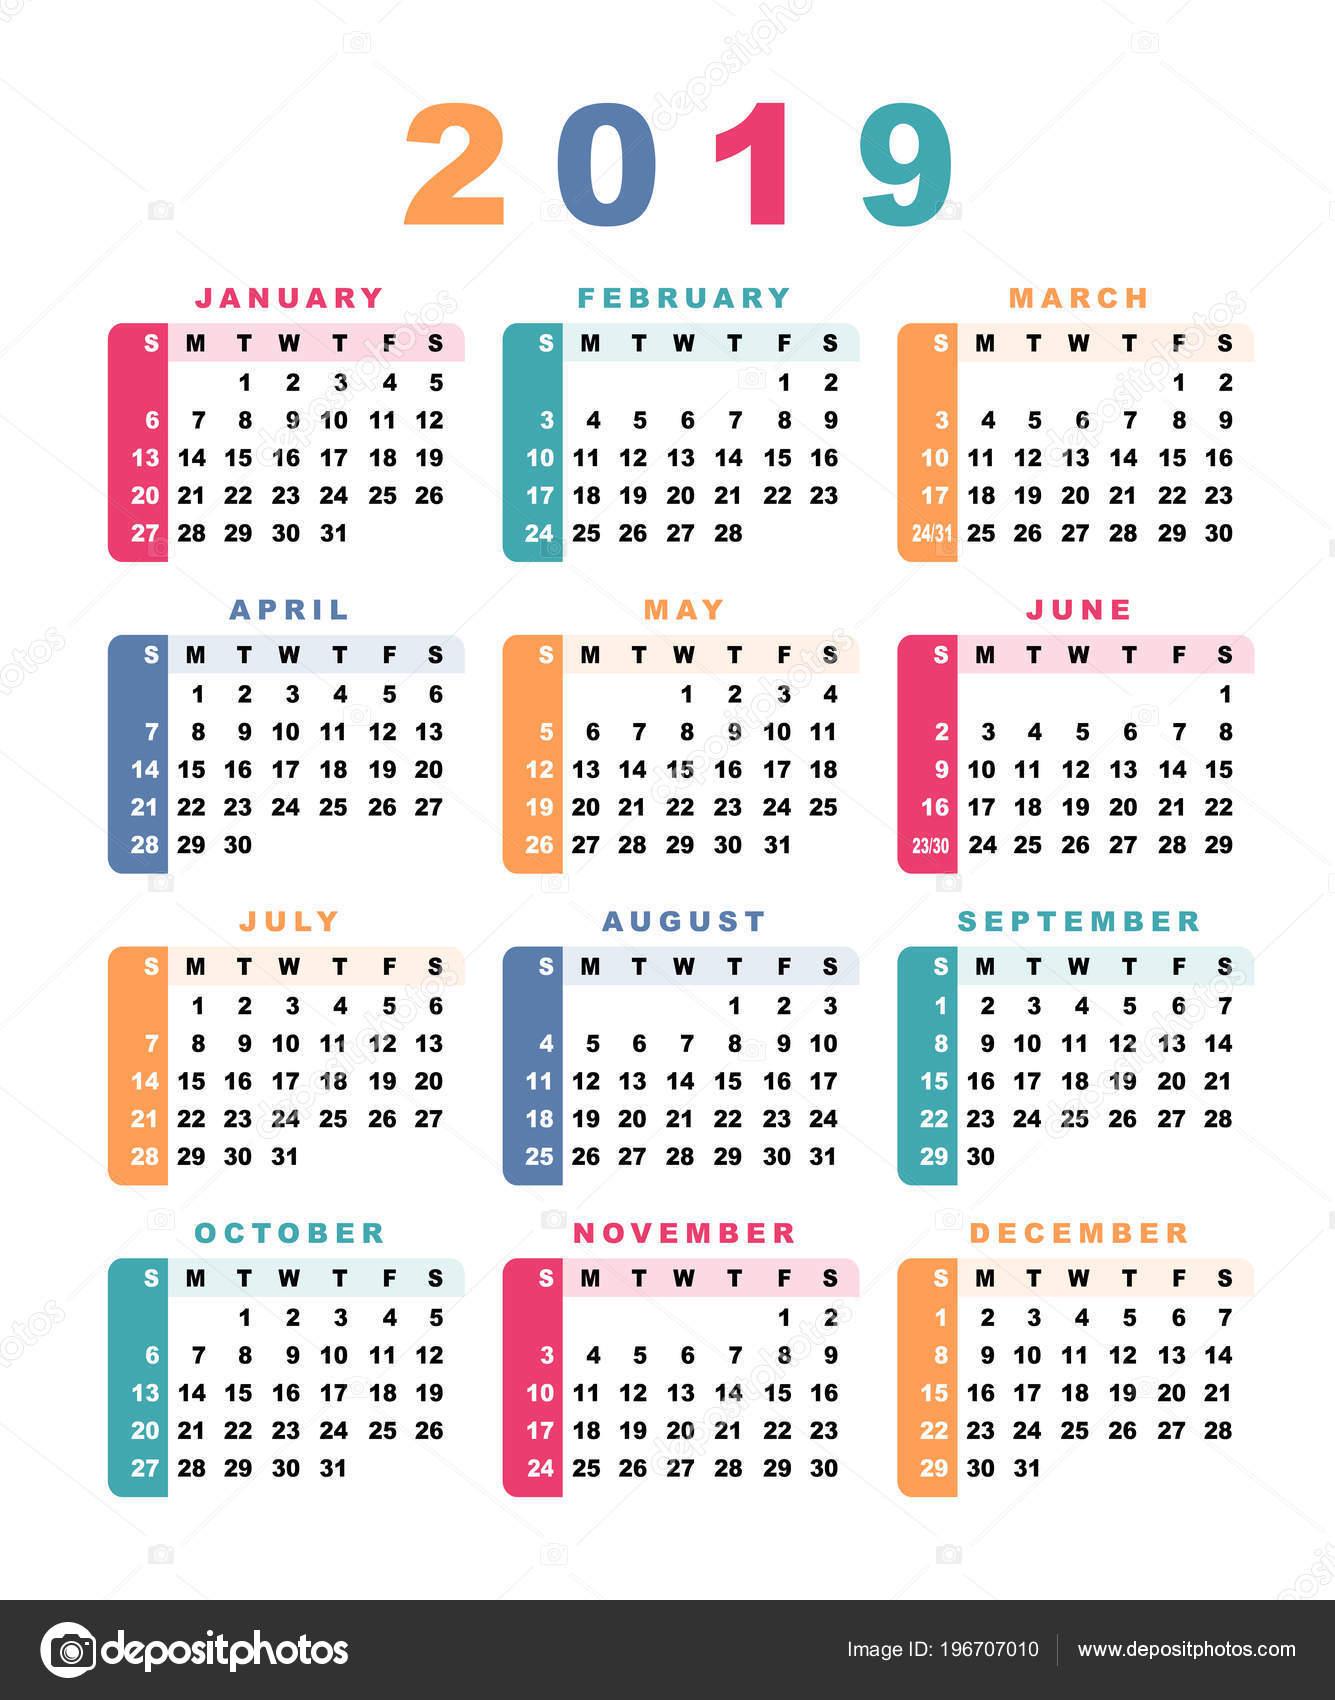 Calendario 2019 Con Numero Week.Calendar 2019 Week Starts Sunday Vector Illustration Stock